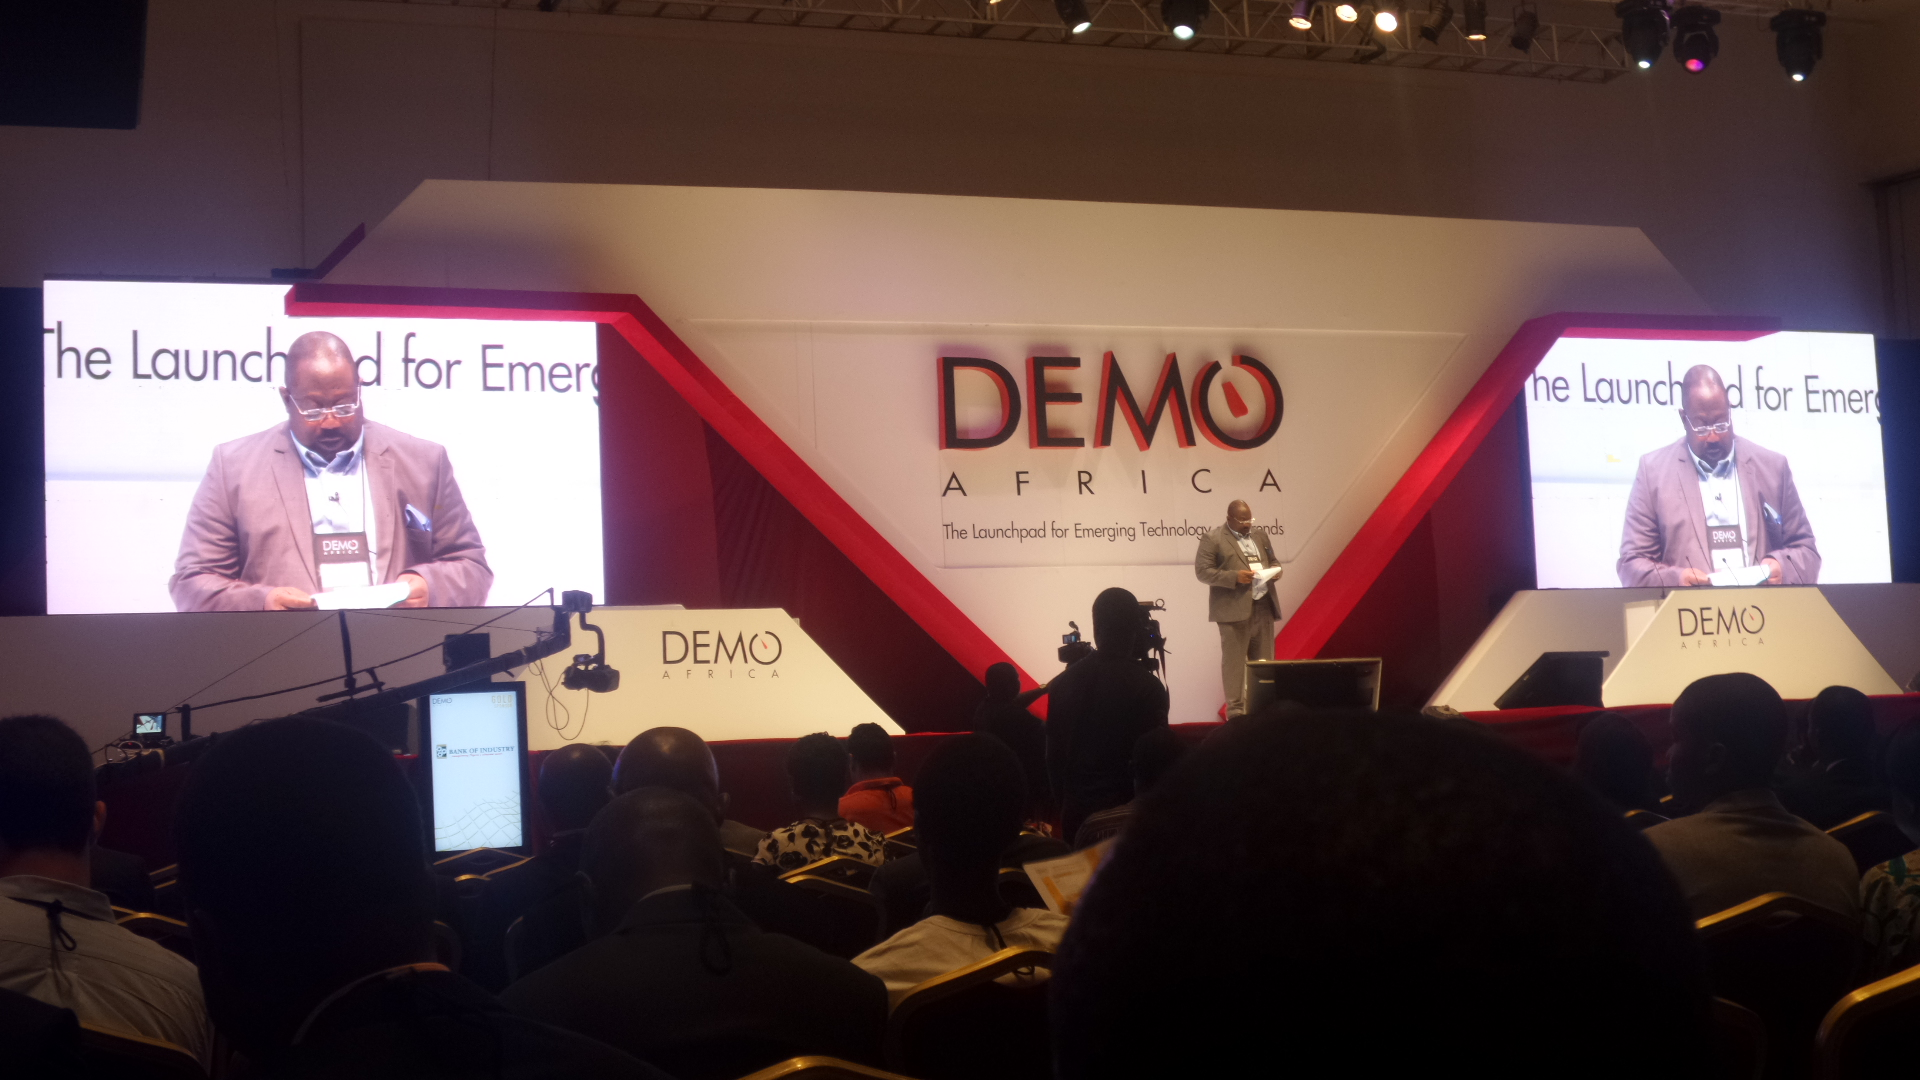 Startups at DEMO Africa 2015